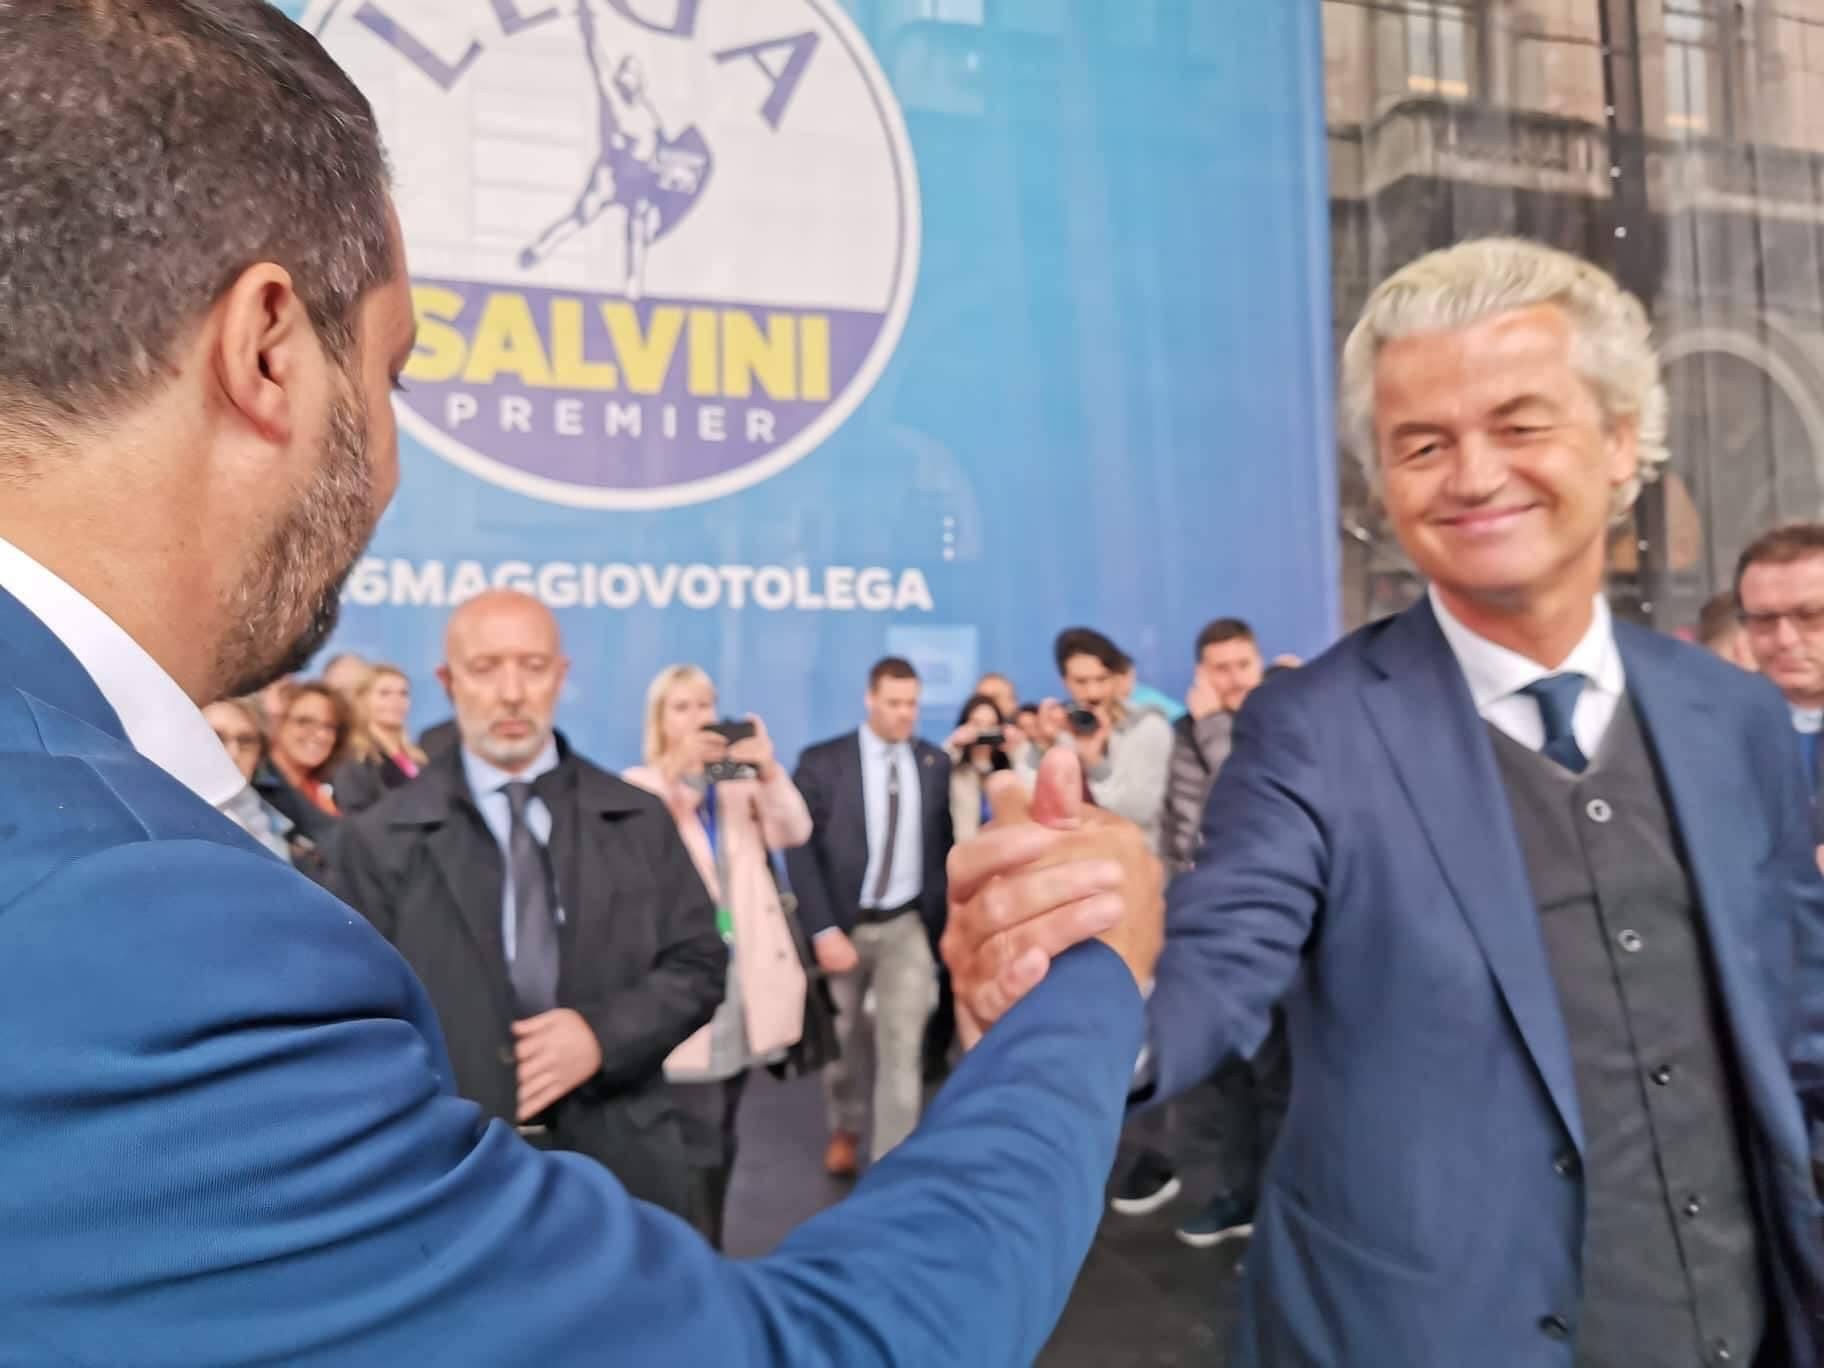 Salvini vince in Italia, ma i sovranisti si fermano all'8% in Europa